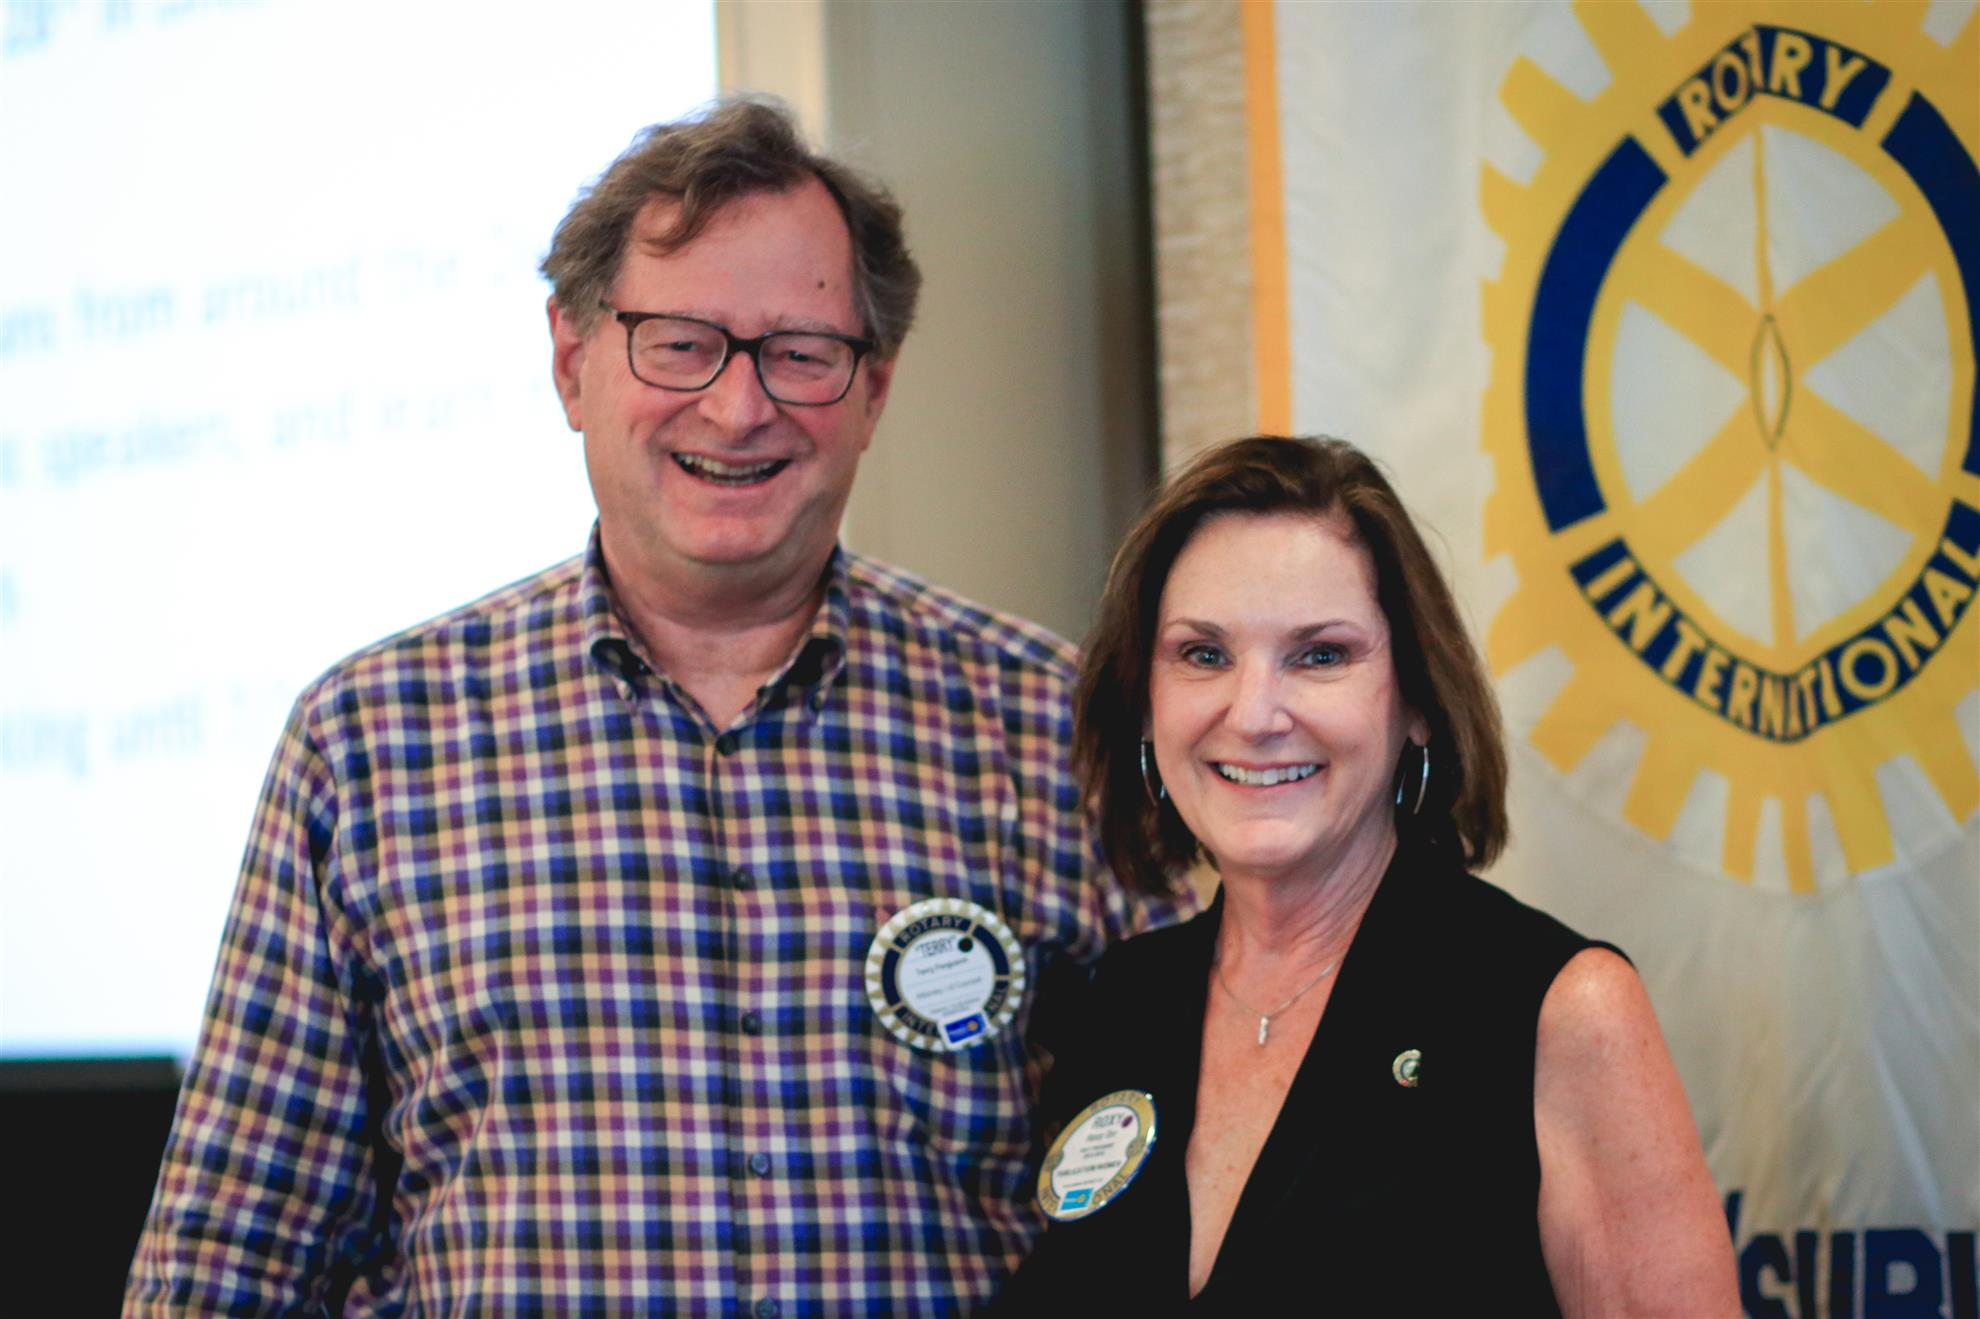 Stories | Rotary Club of Omaha Suburban